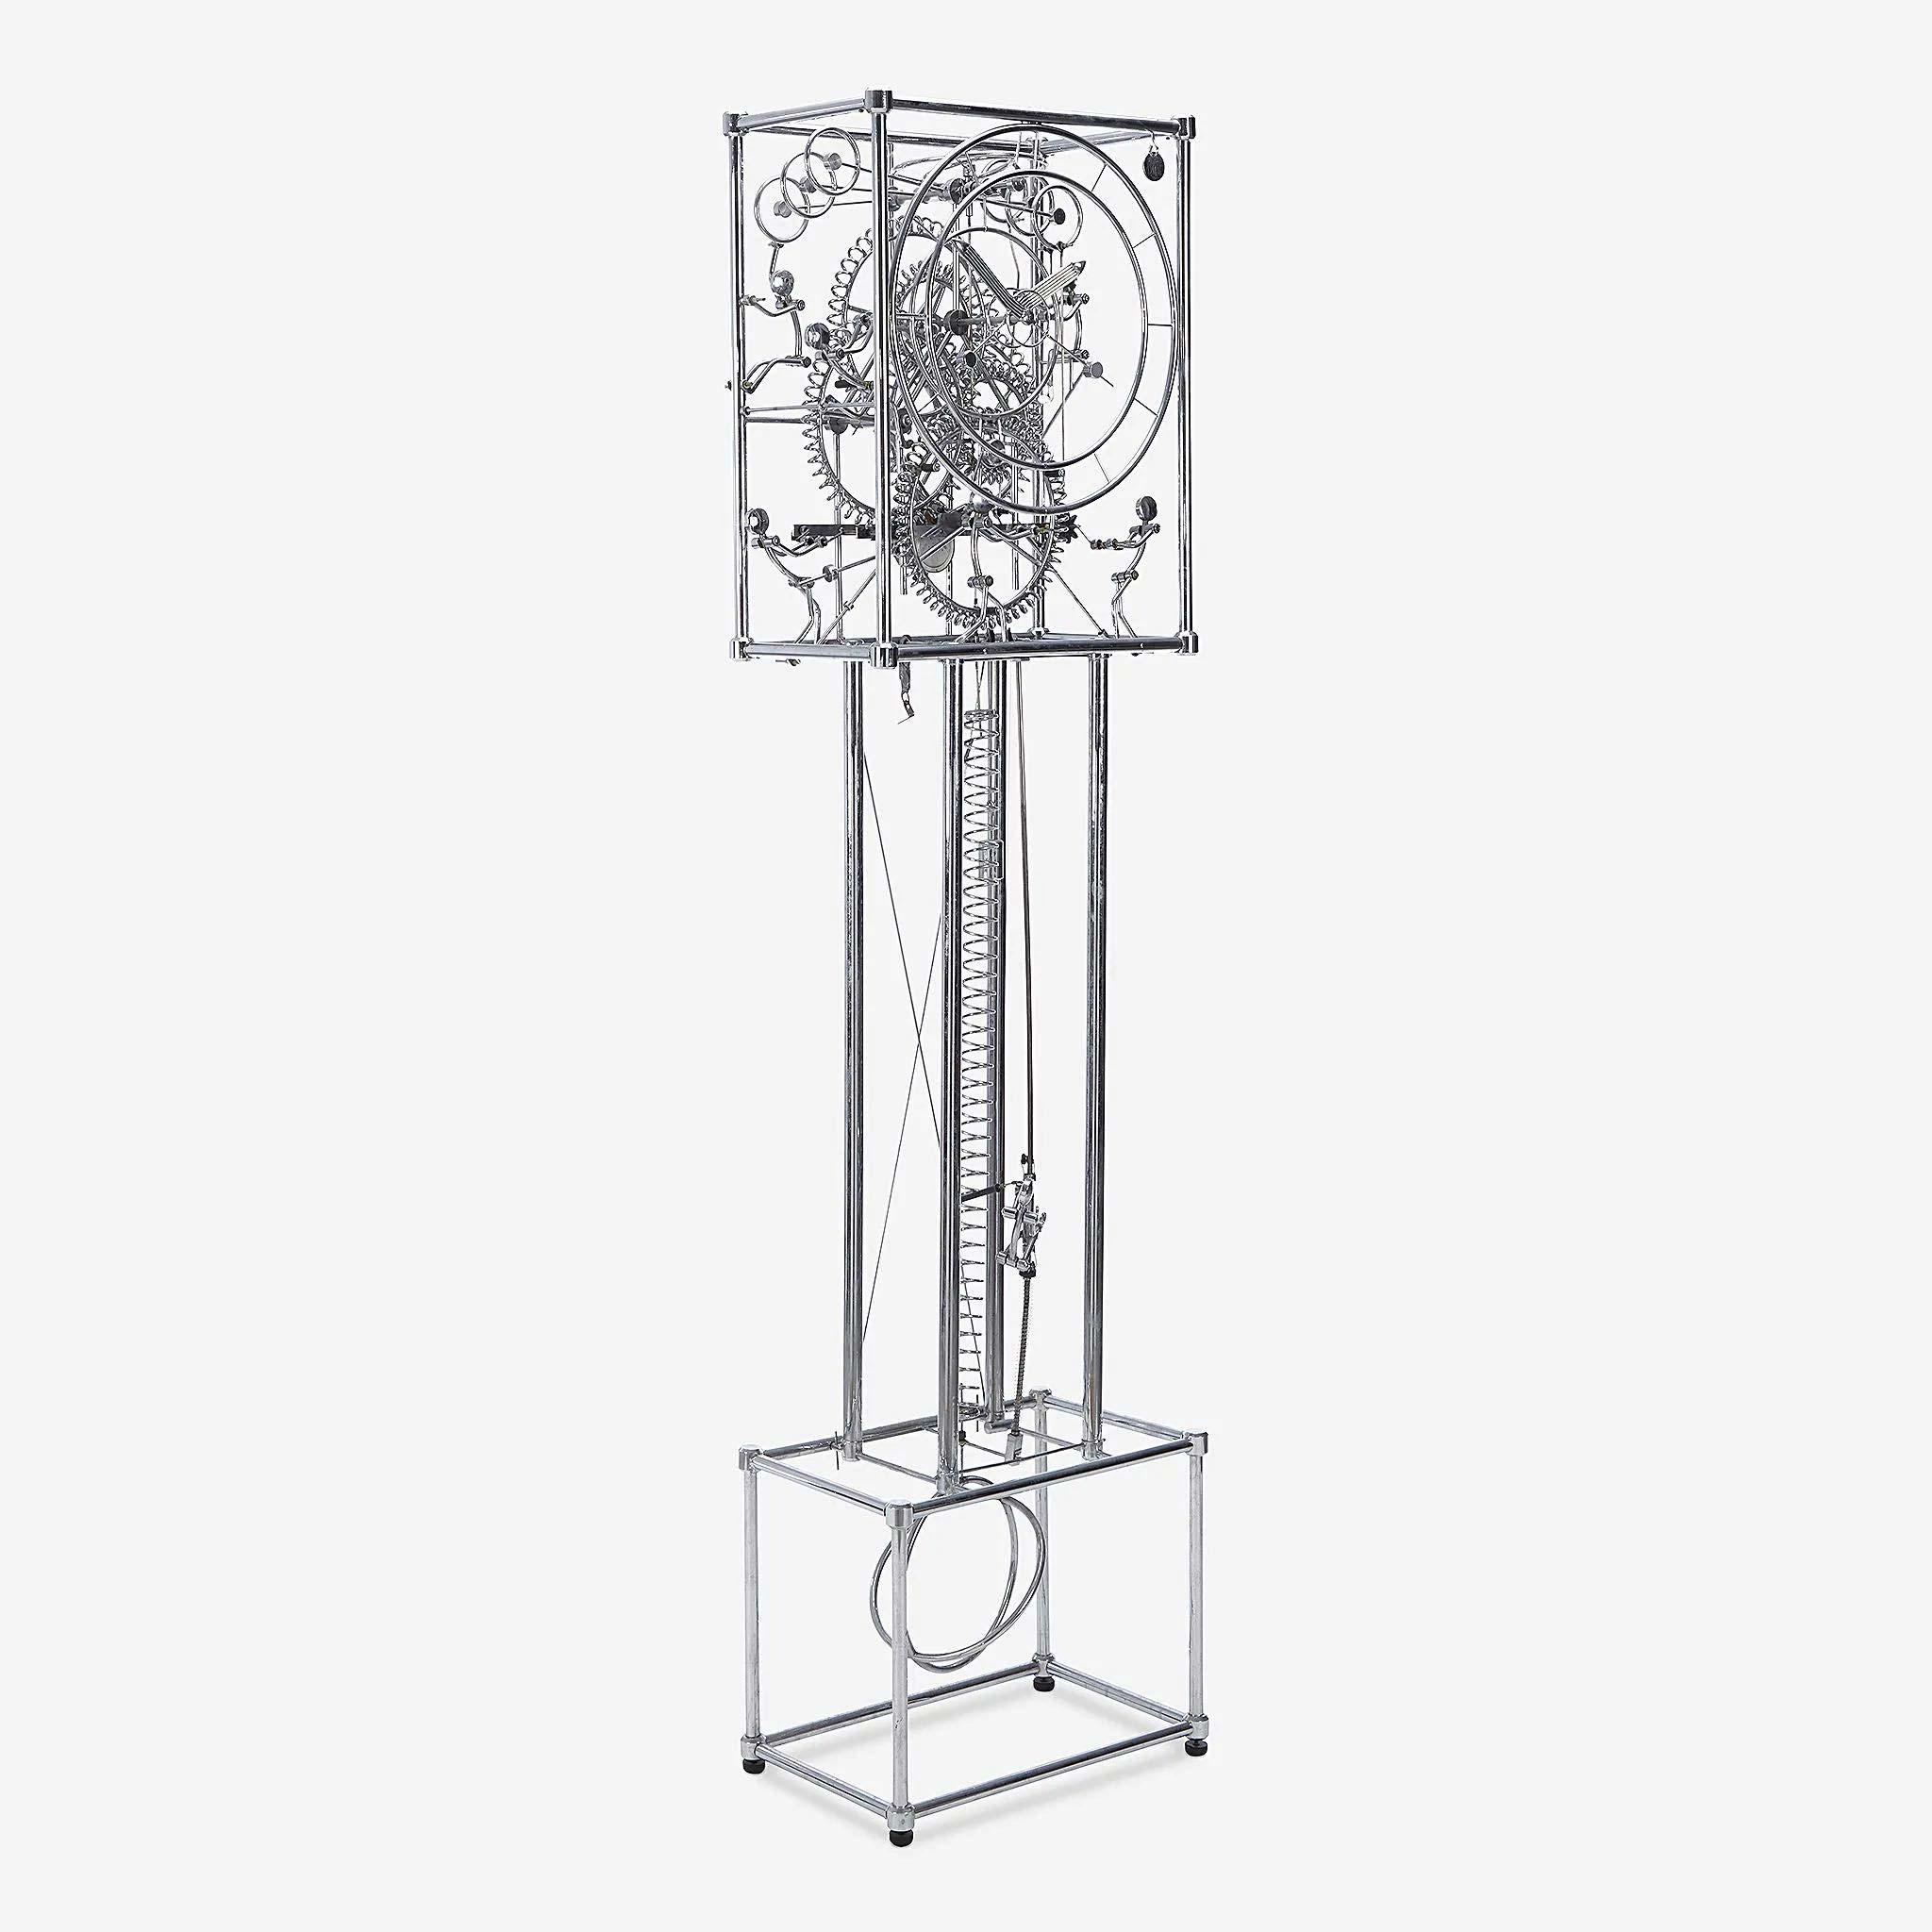 Gordon Bradt (American, b. 1924), 'The Seven Man' kinetic grandfather clock, late 20th century, $10,000 plus buyer's premium. Image courtesy Freeman's